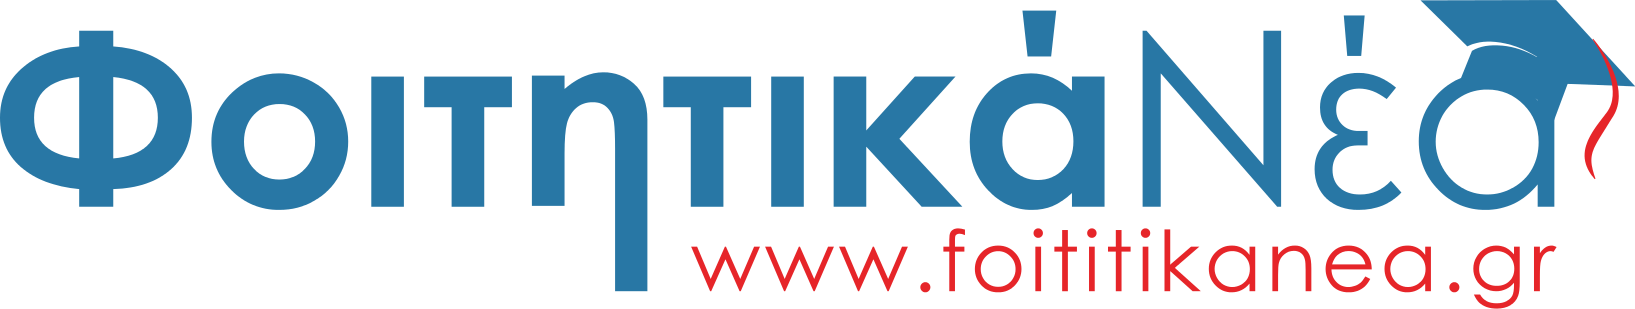 Foititika Nea - Logo